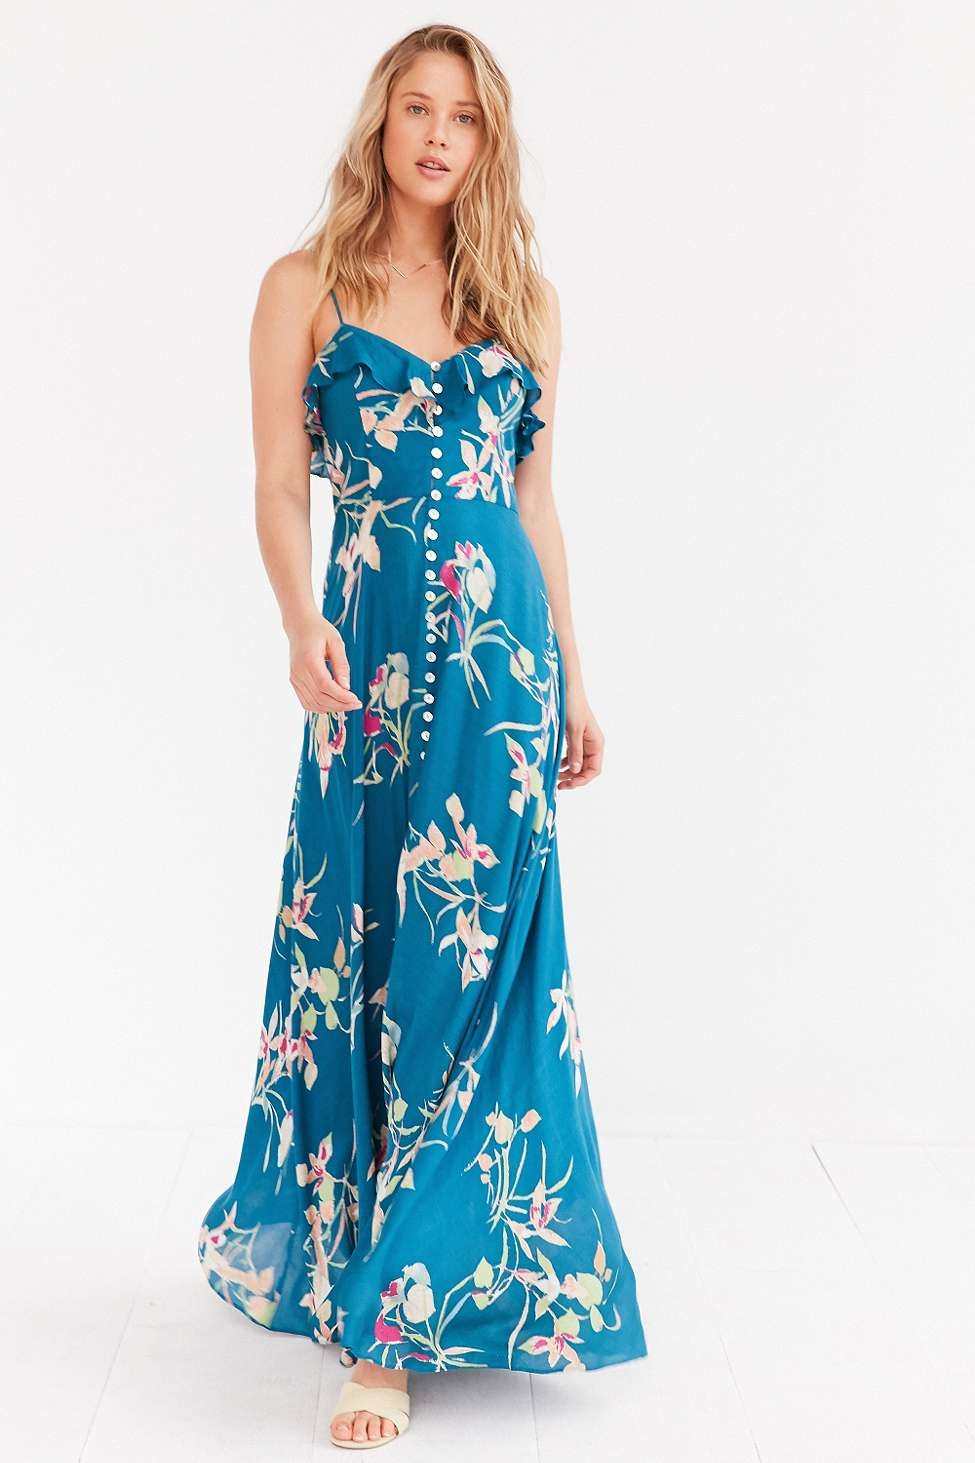 Kimchi Blue La Playa Button-Down Blue Maxi Dress | Kimchi, Blue ...